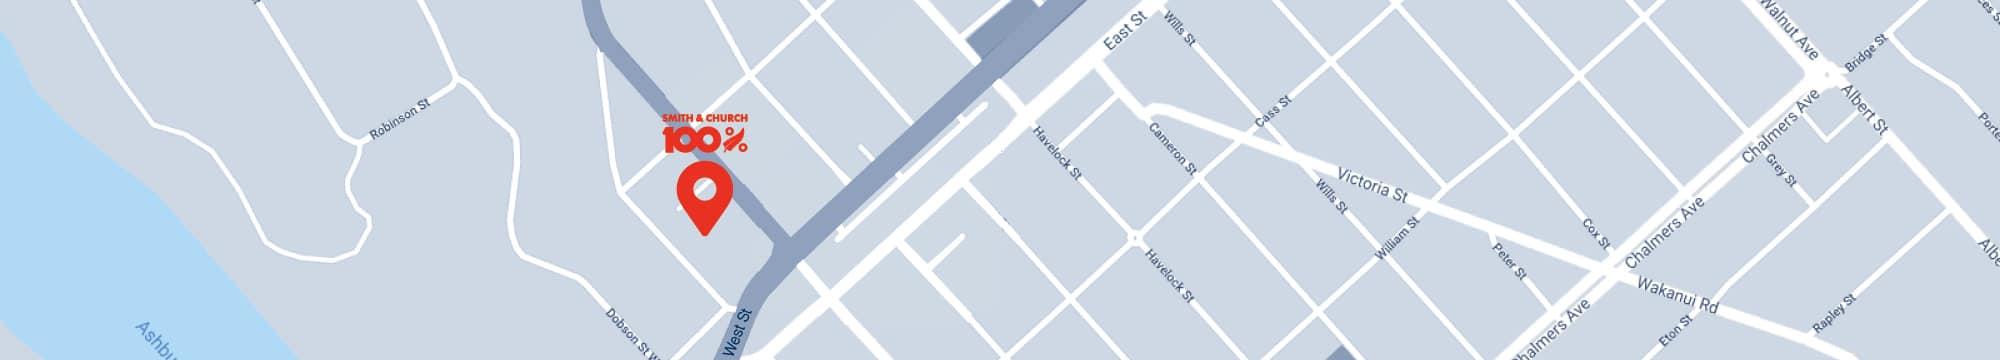 100% Smith & Church ElectraServe 1600x288 Map